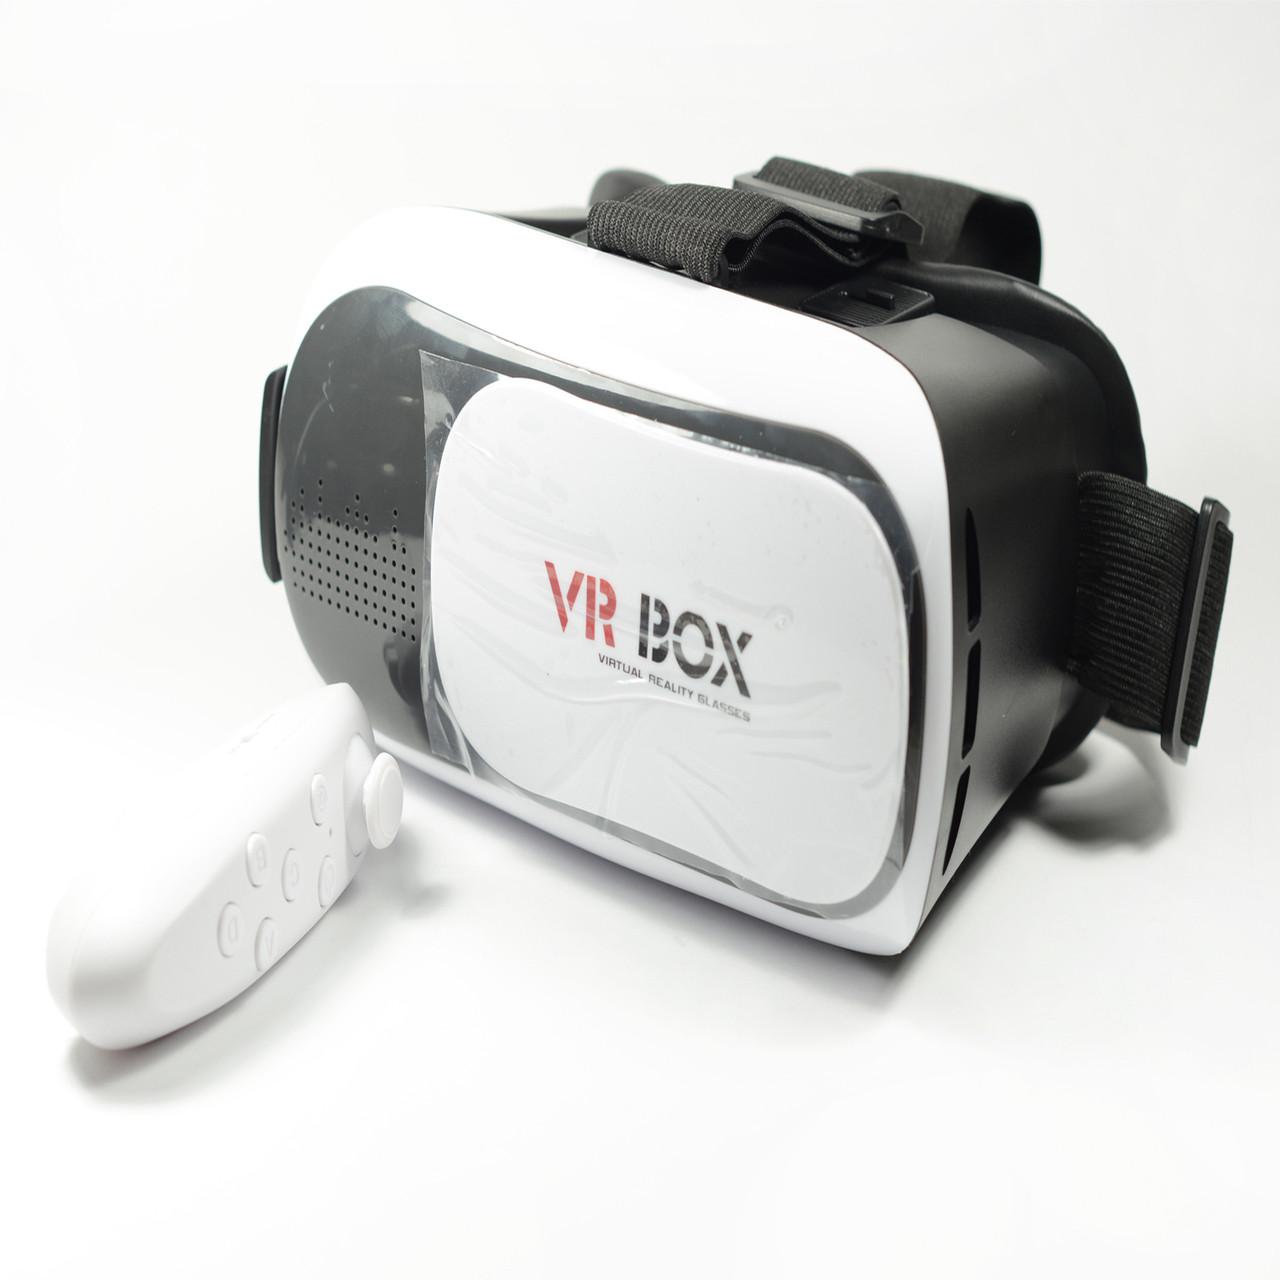 231b2aefd187 2nd Generation VR Box Virtual Reality 3D Glasses Bluetooth Control -  Godaca